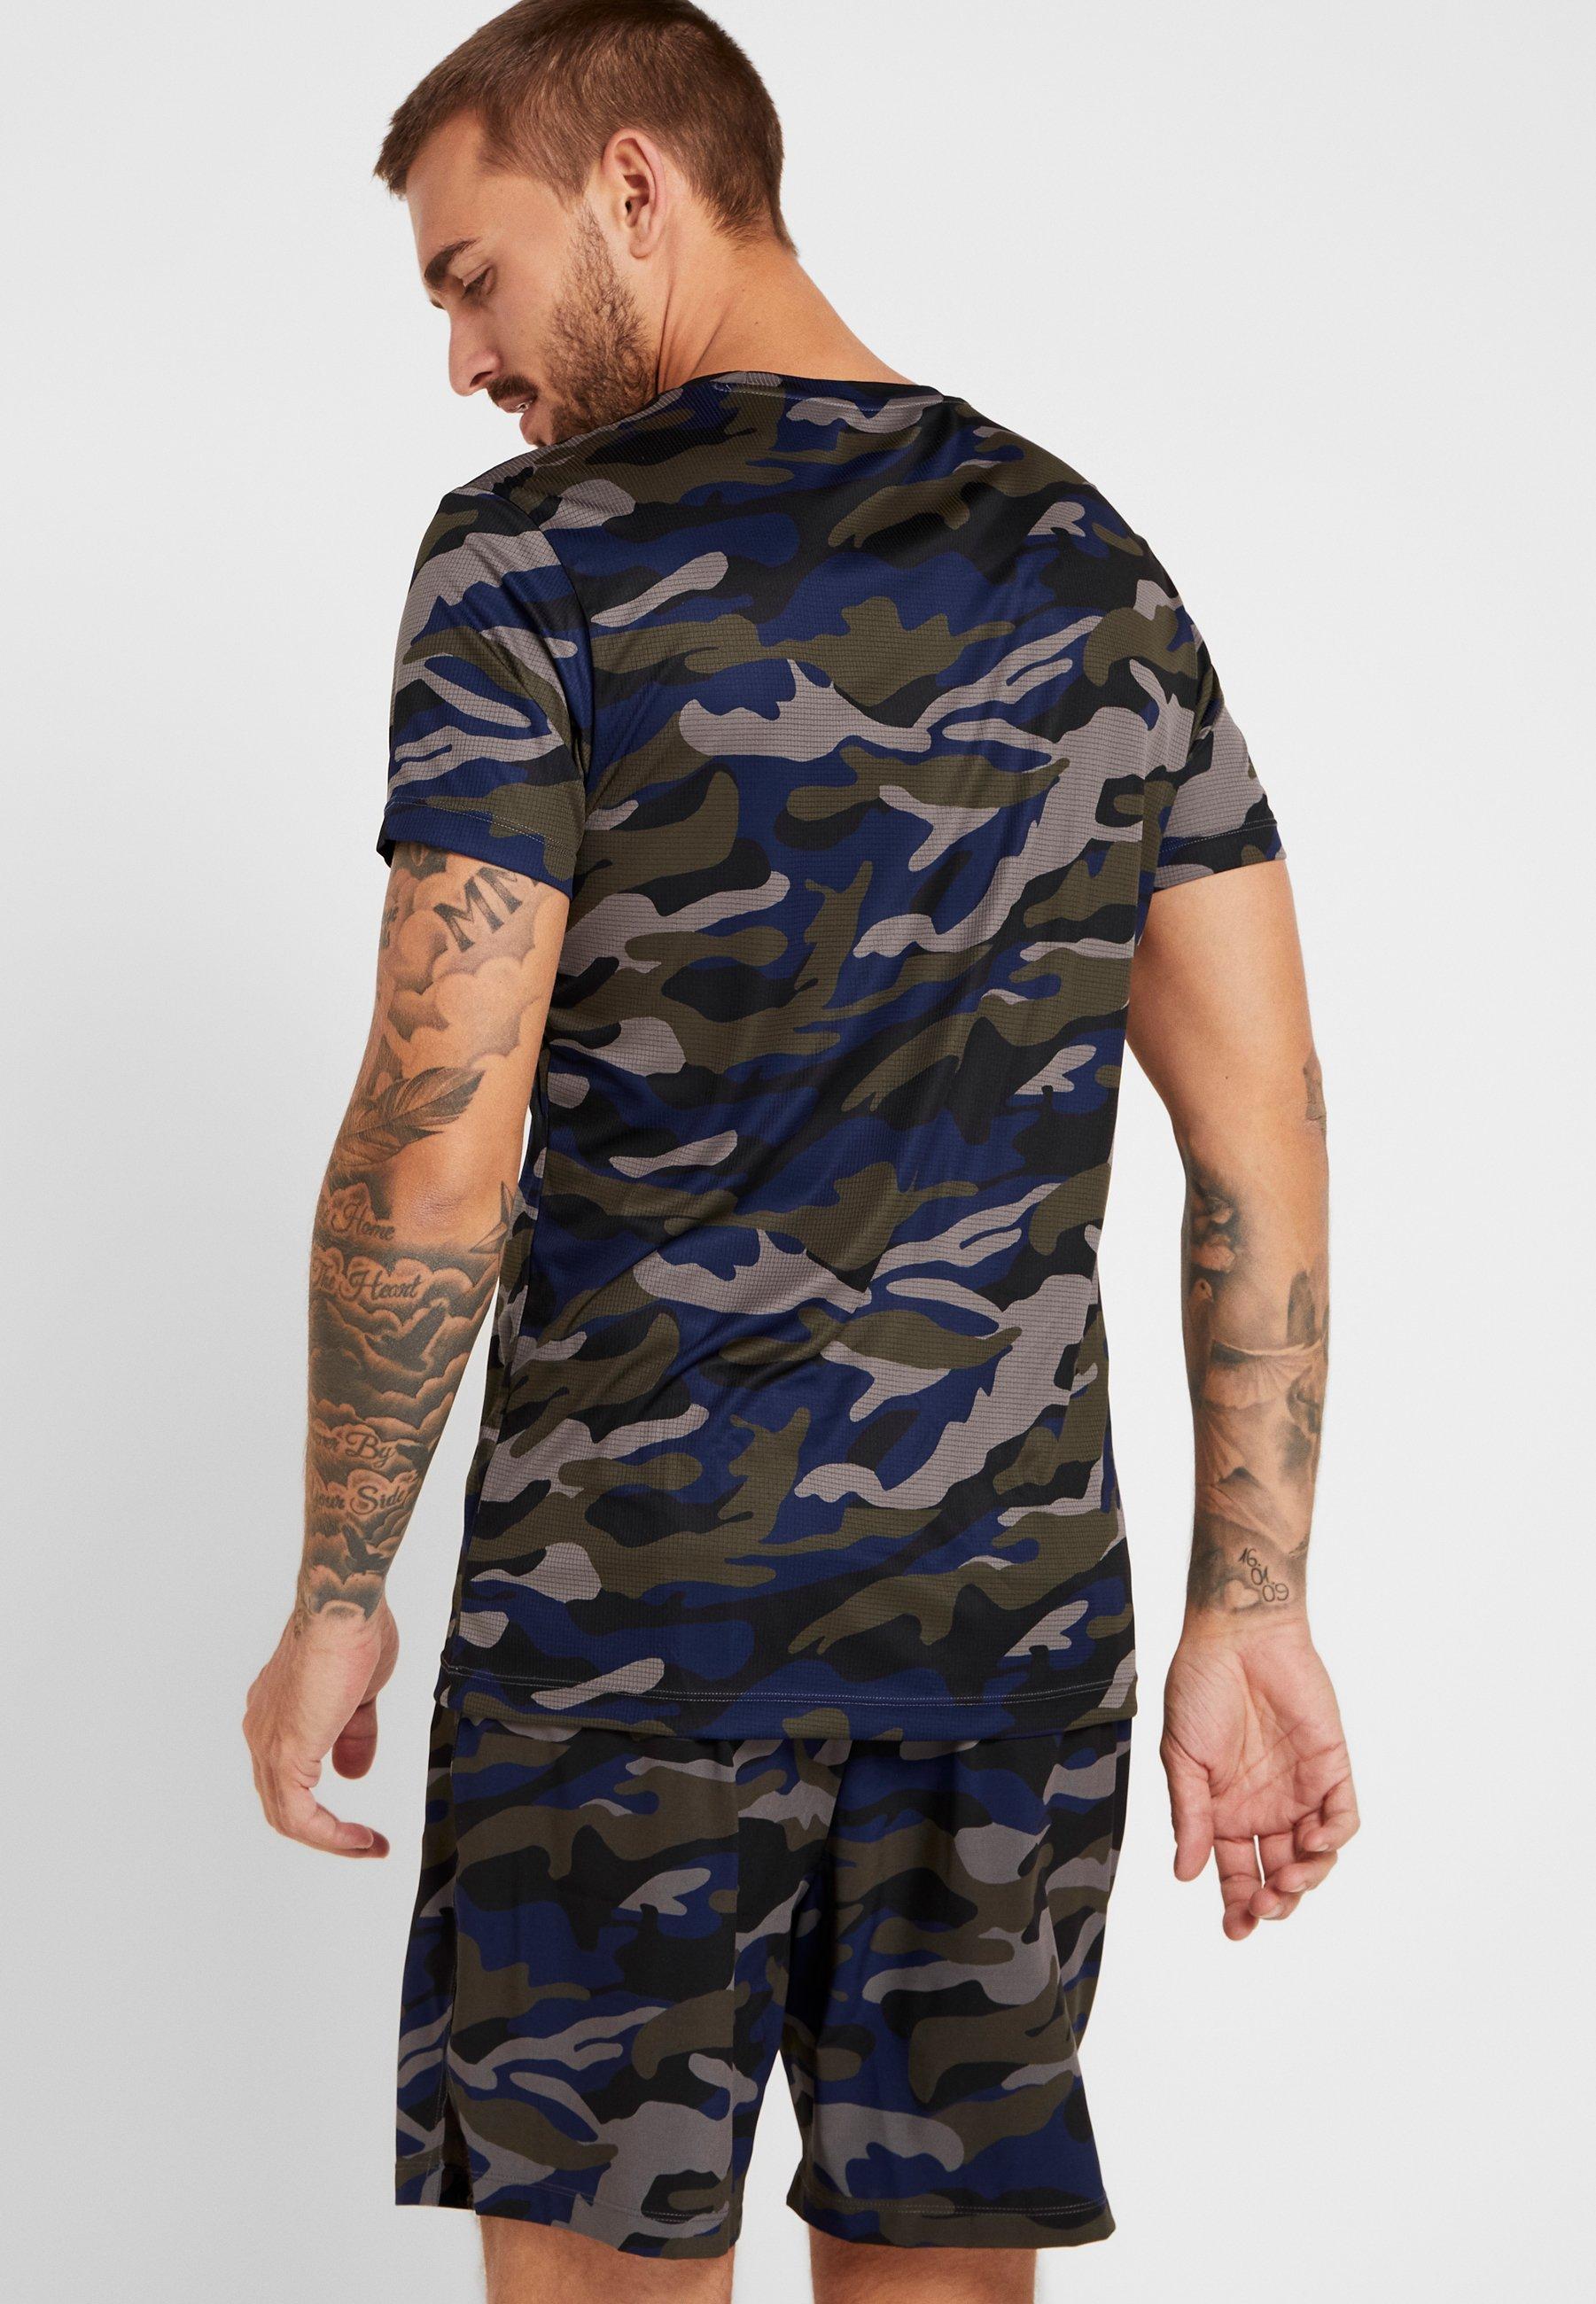 AtosT Tee Borg shirt Björn Night Forest Imprimé hCsdtQr